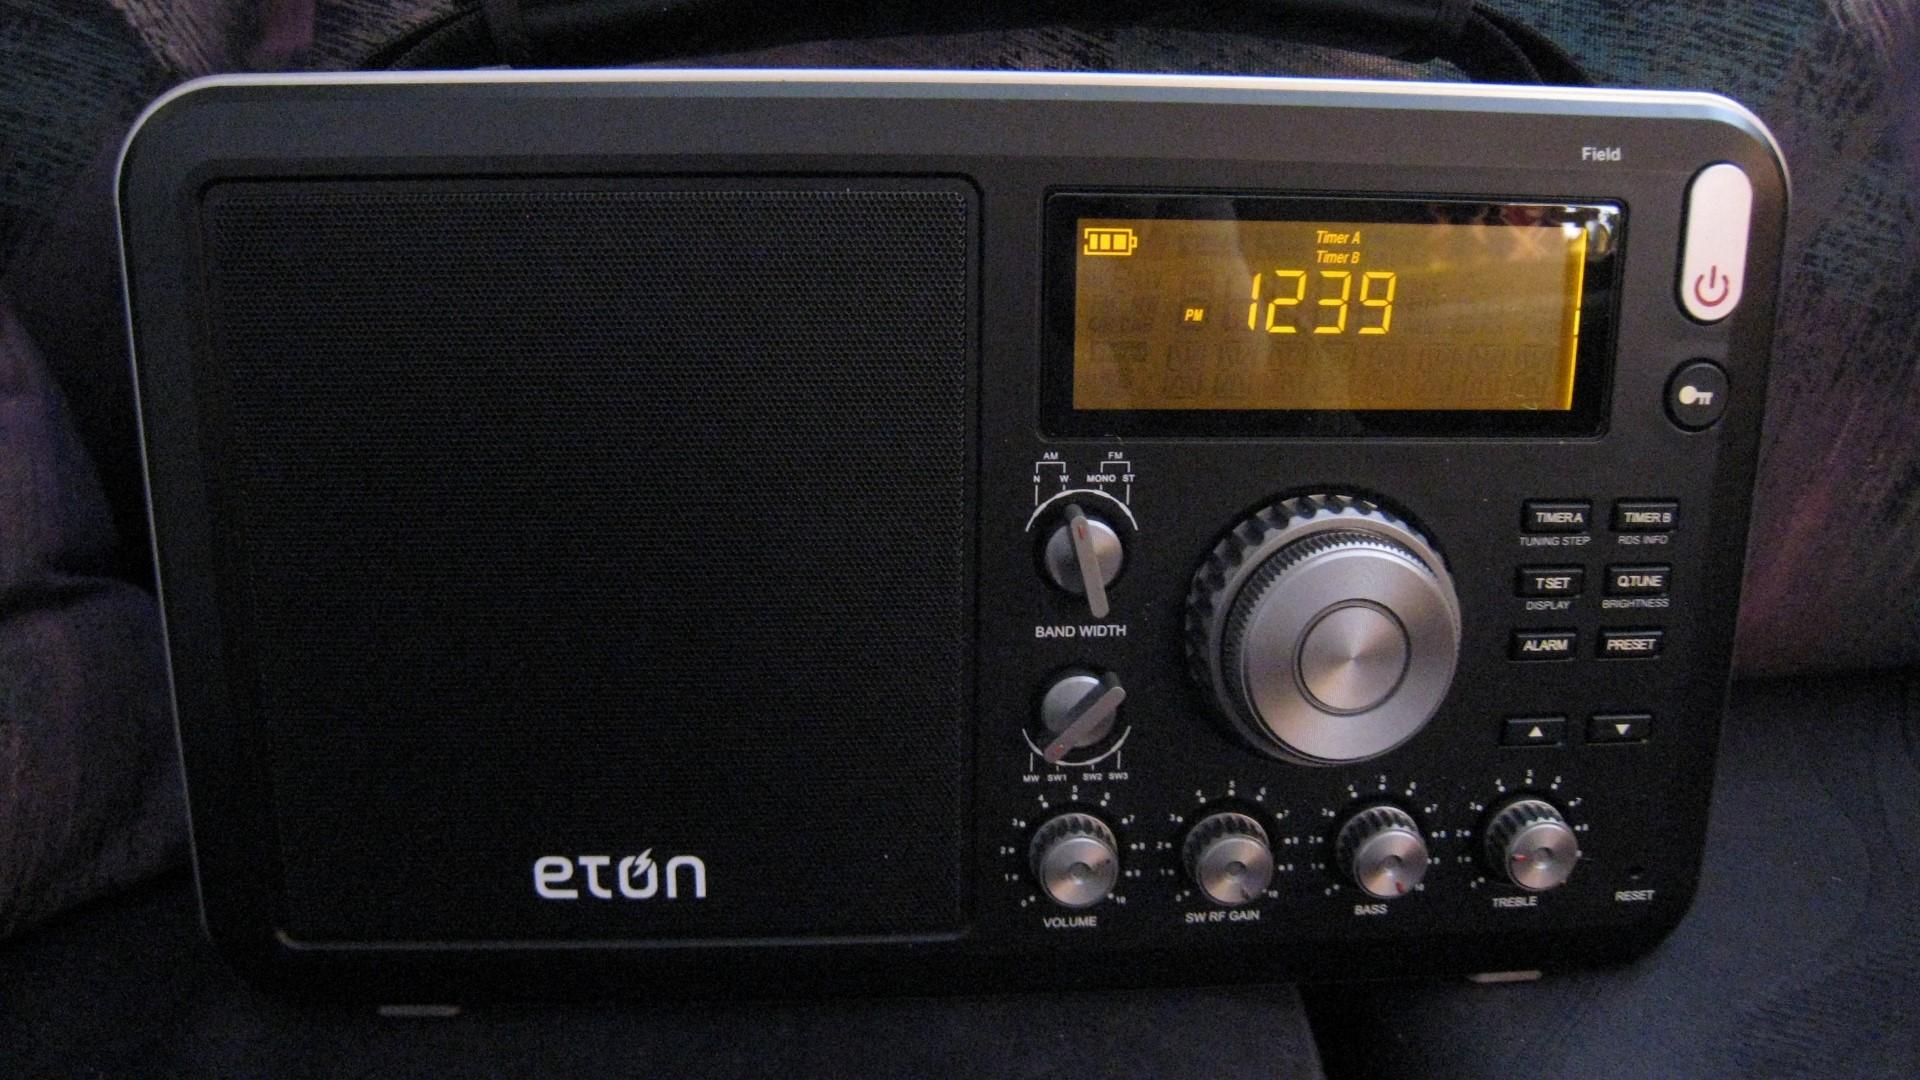 Sleep Timer Eton Grundig AM//FM Shortwave Field RADIO with Alarm Clock RDS